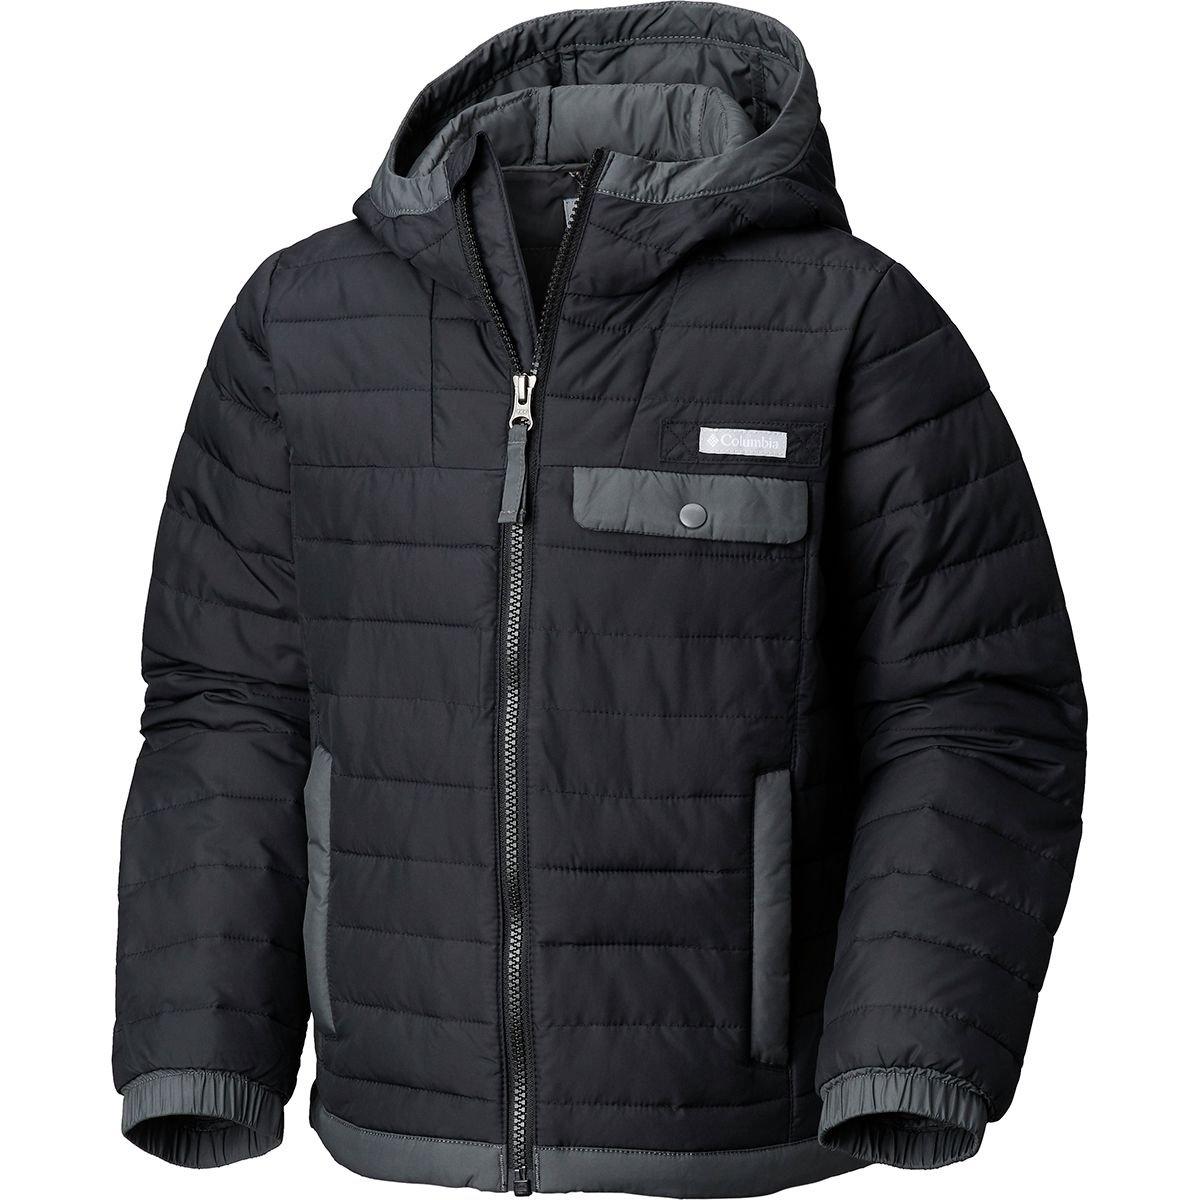 Columbia Kids Boy's Mountainside¿ Full Zip Jacket (Little Kids/Big Kids) Black/Grill Medium